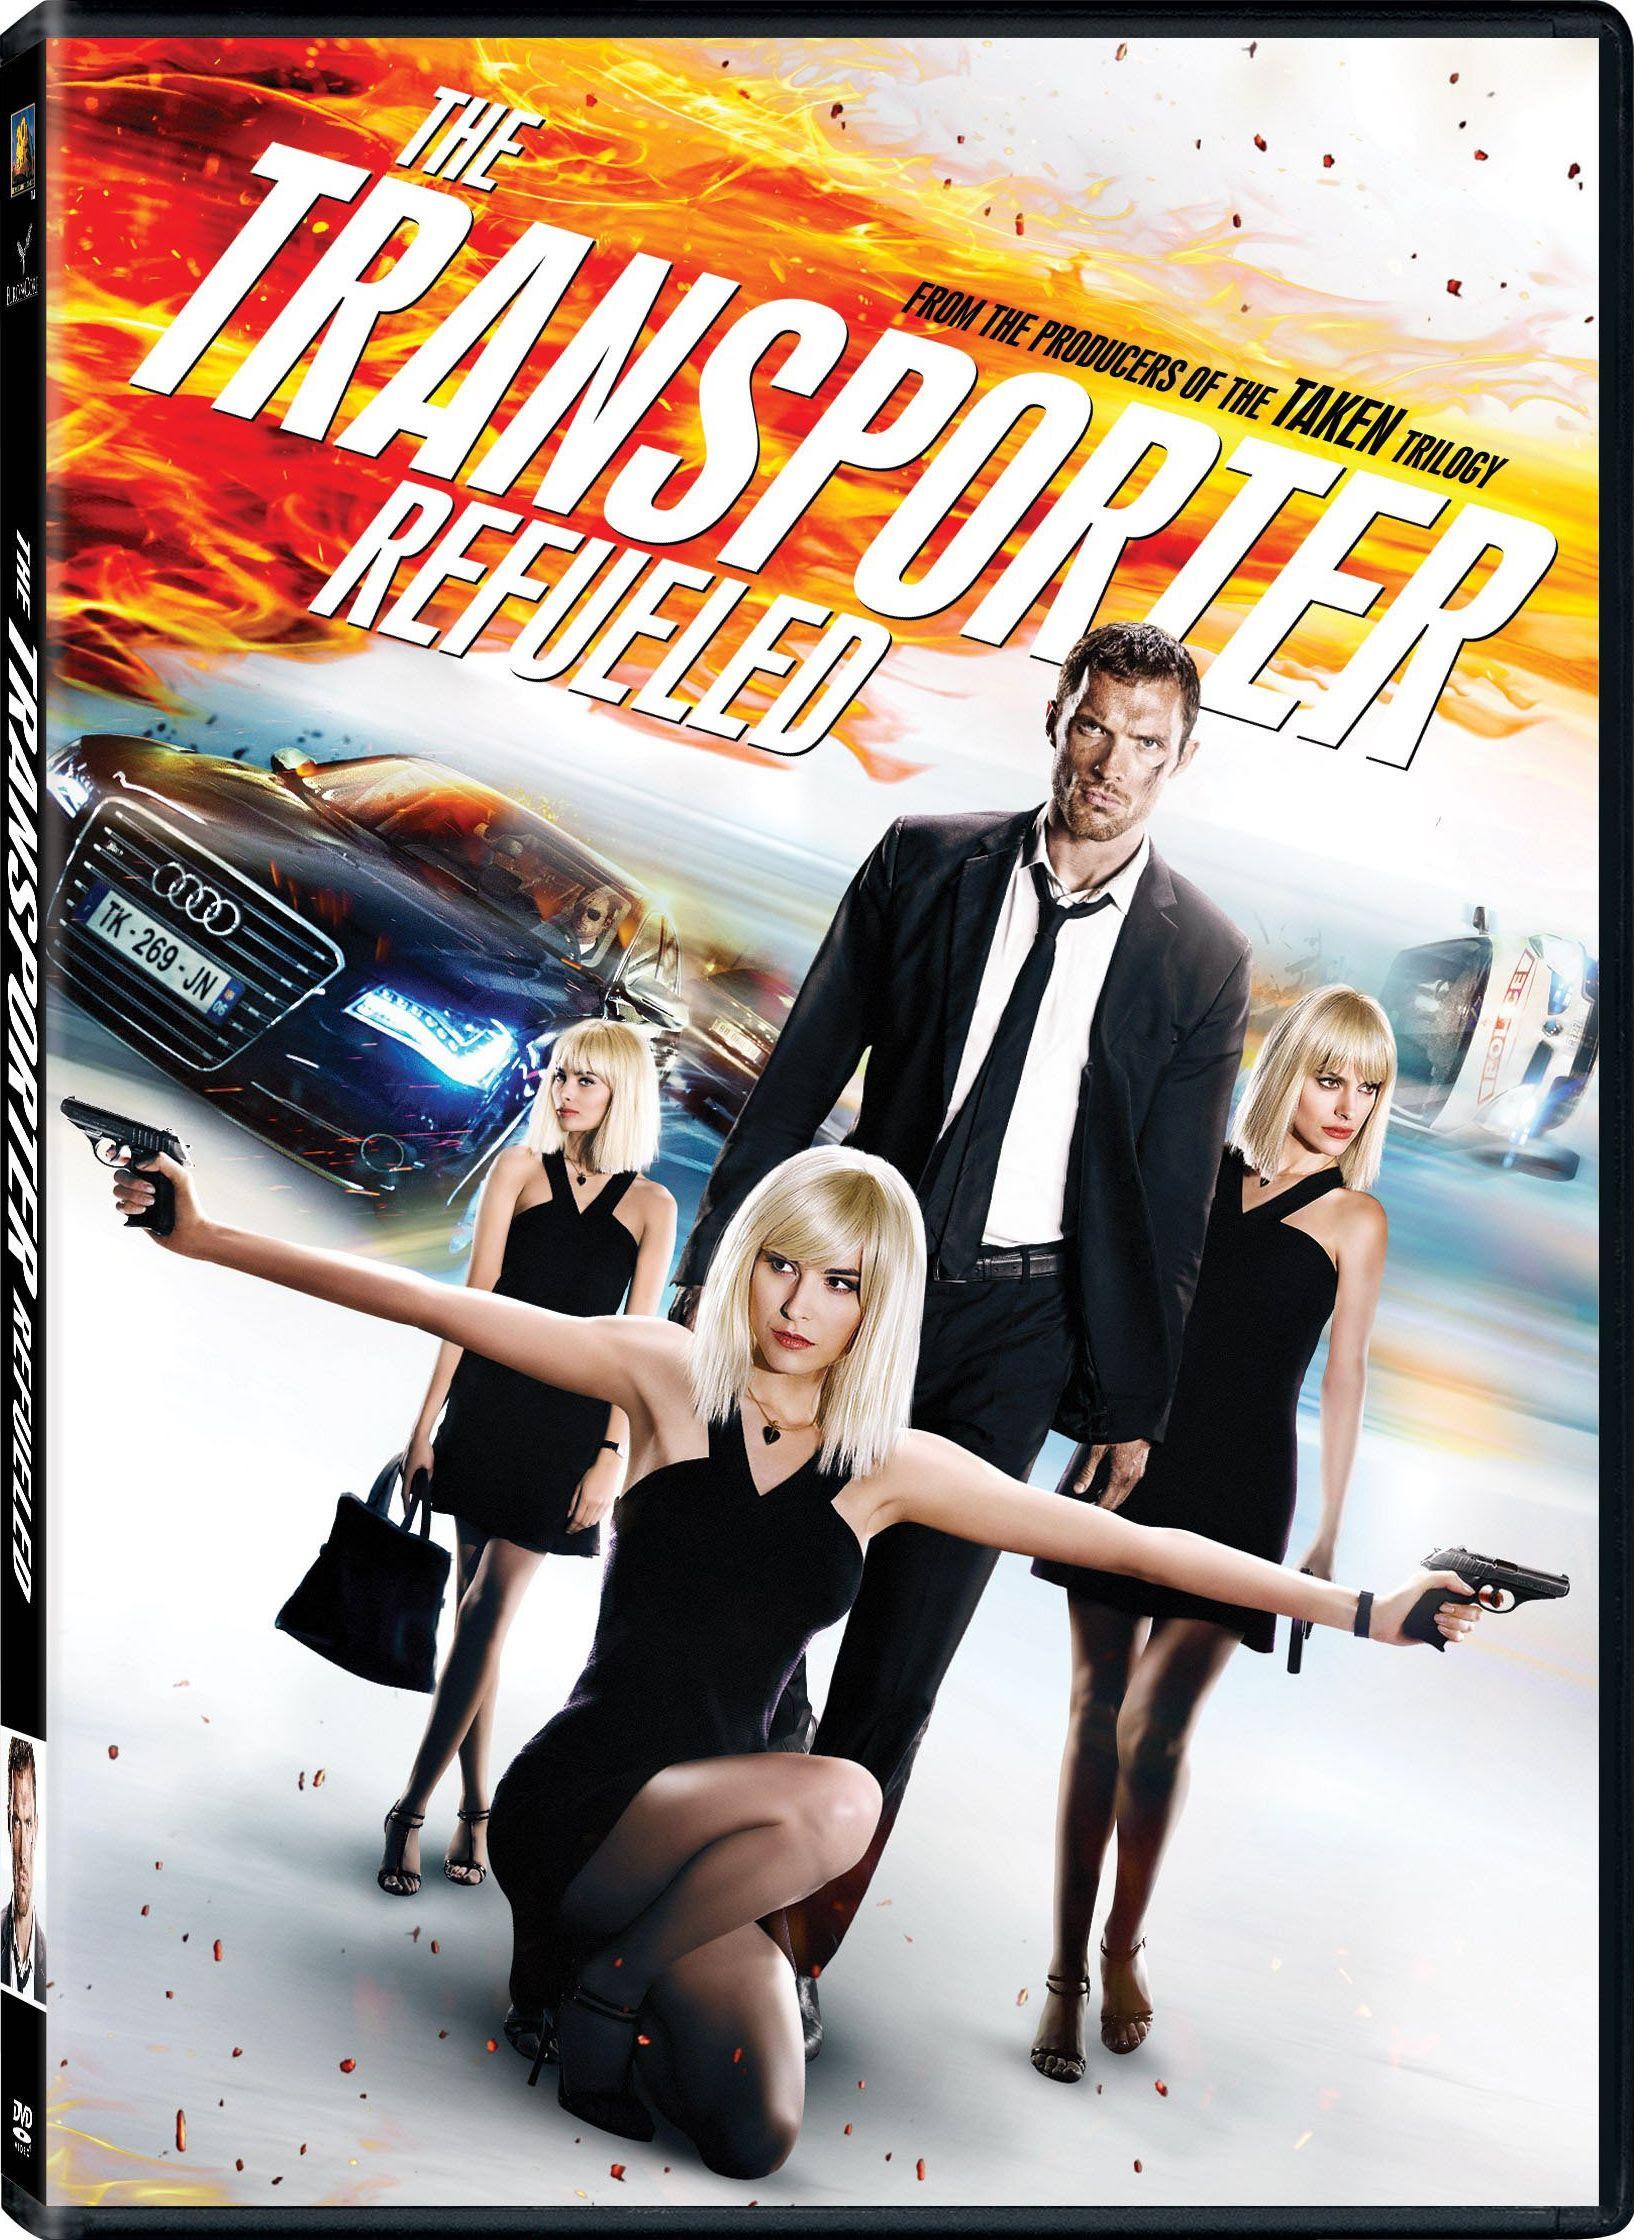 The Transporter Refueled DVD Release Date December 8, 2015